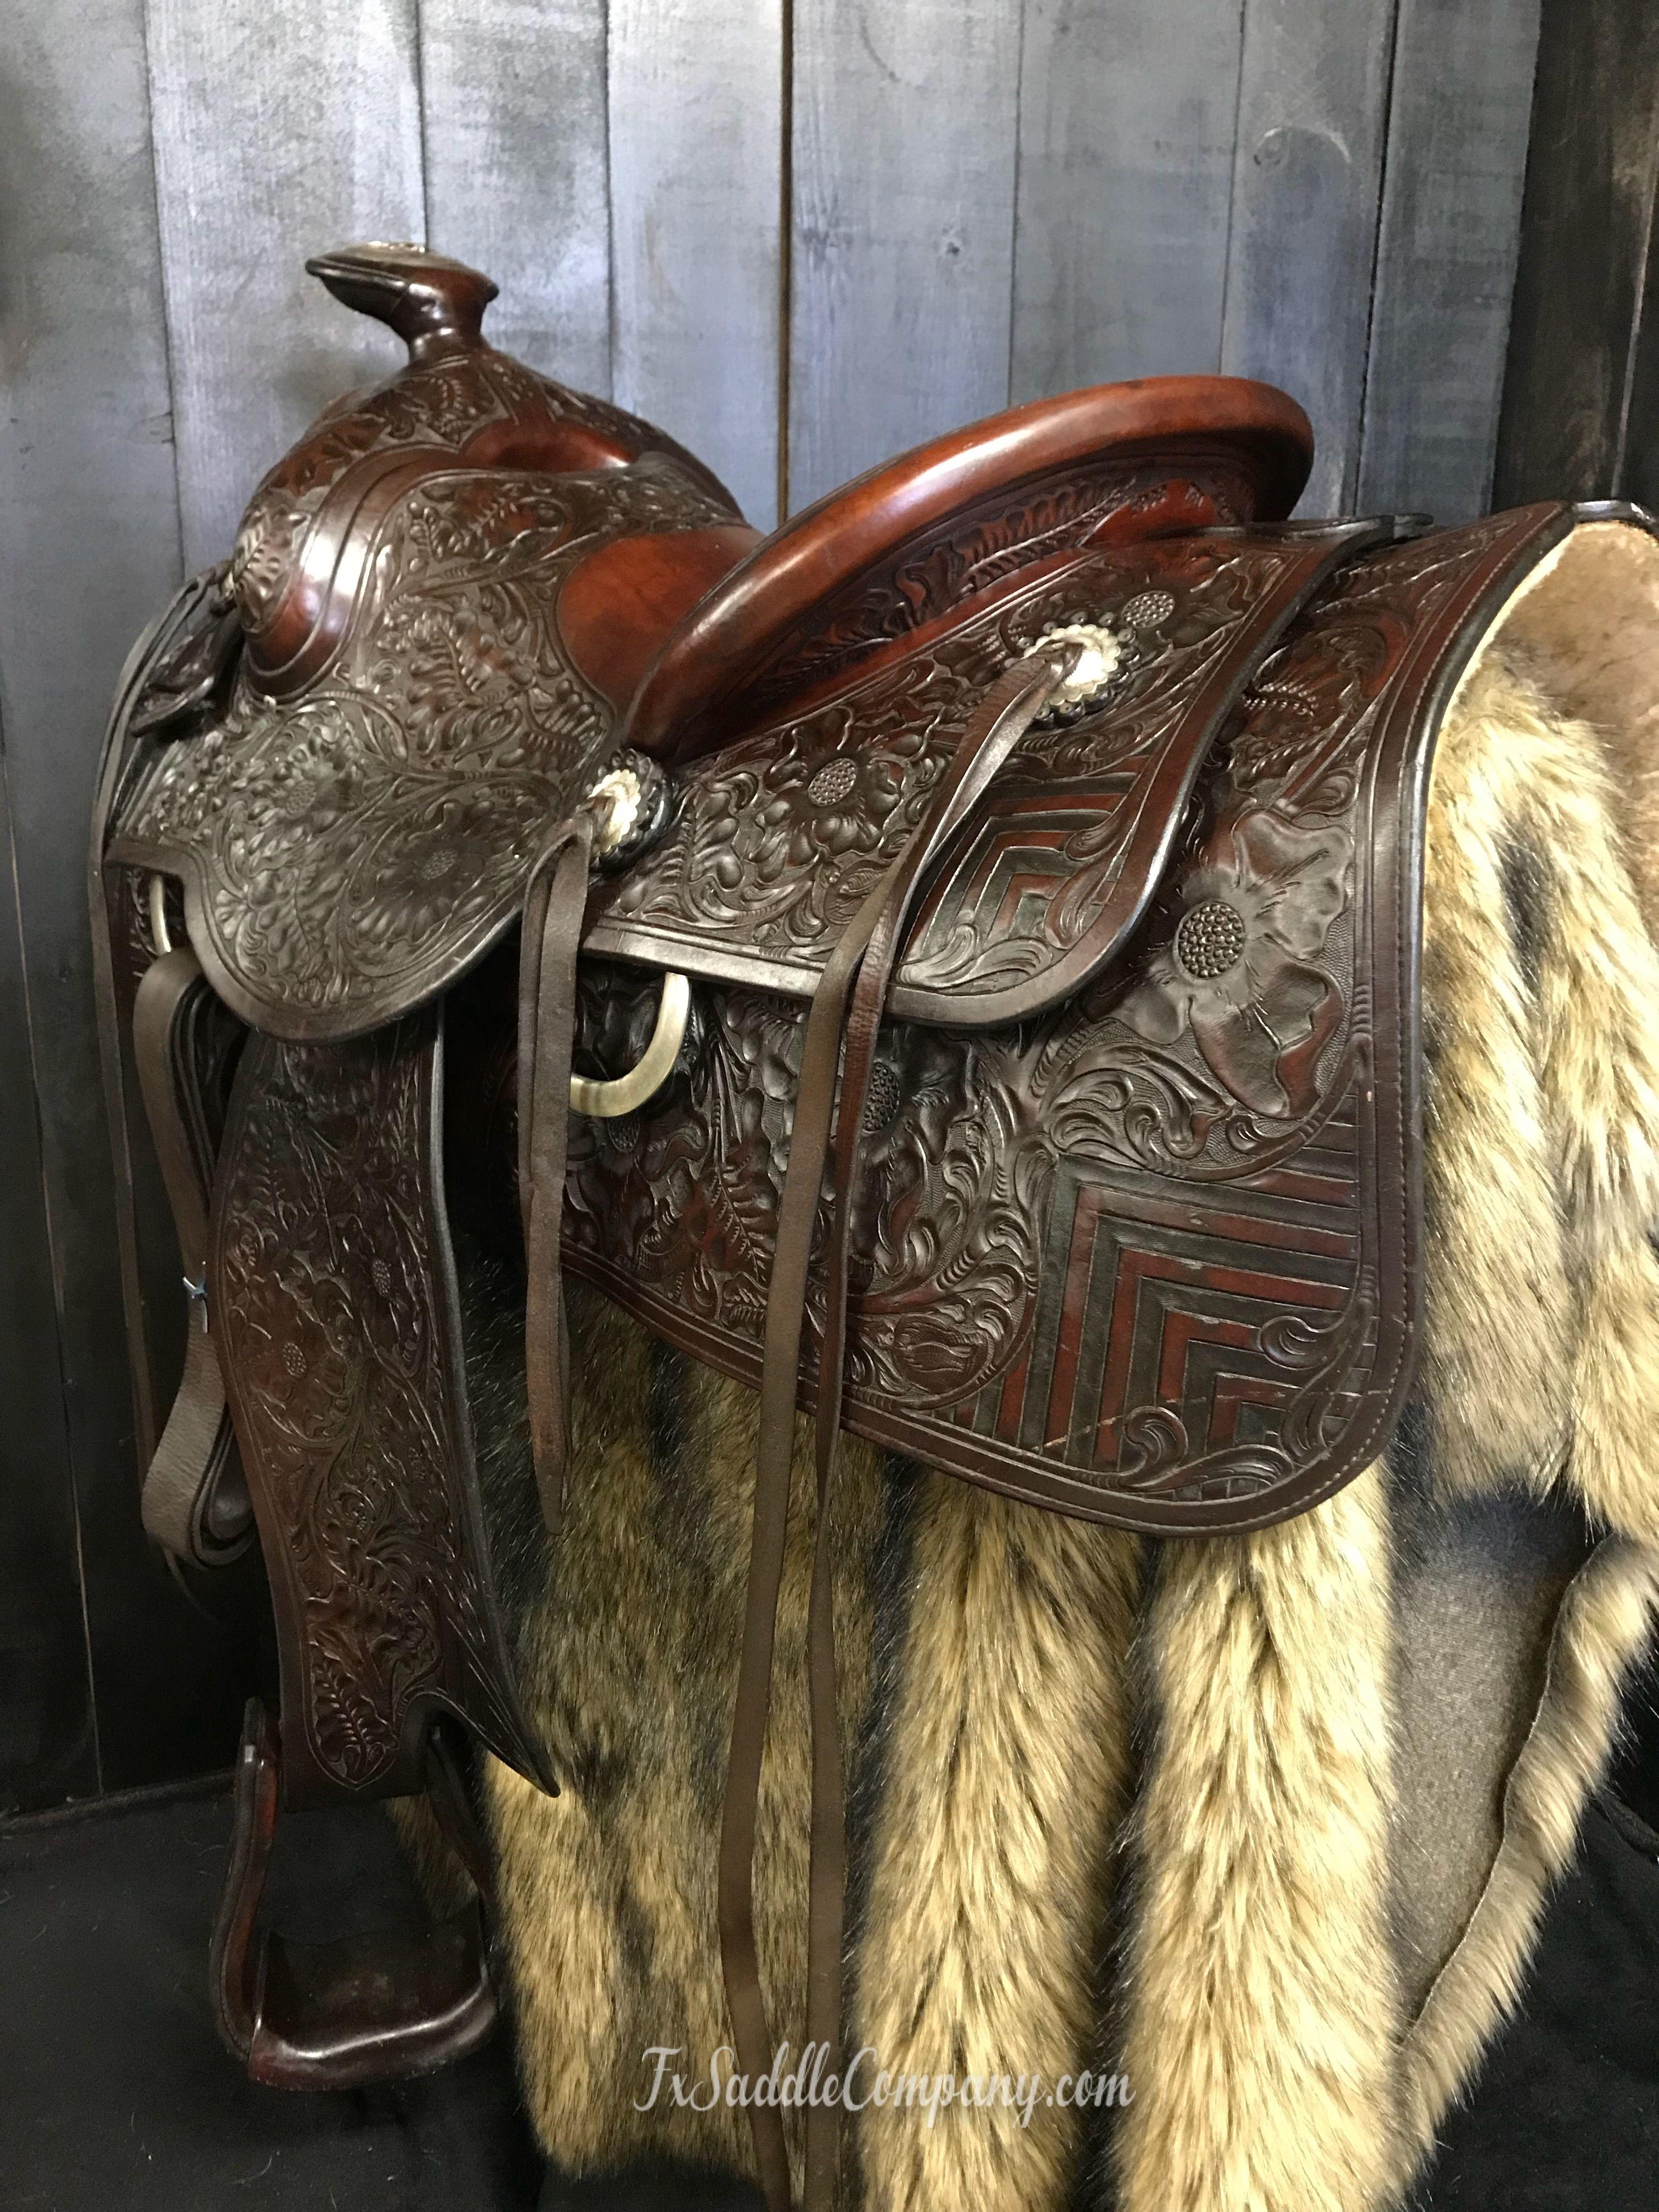 1944 Vintage Custom Built Hamley Roping Saddle For Sale At Fx Saddle Co Roping Saddles Roping Saddles For Sale Saddles For Sale